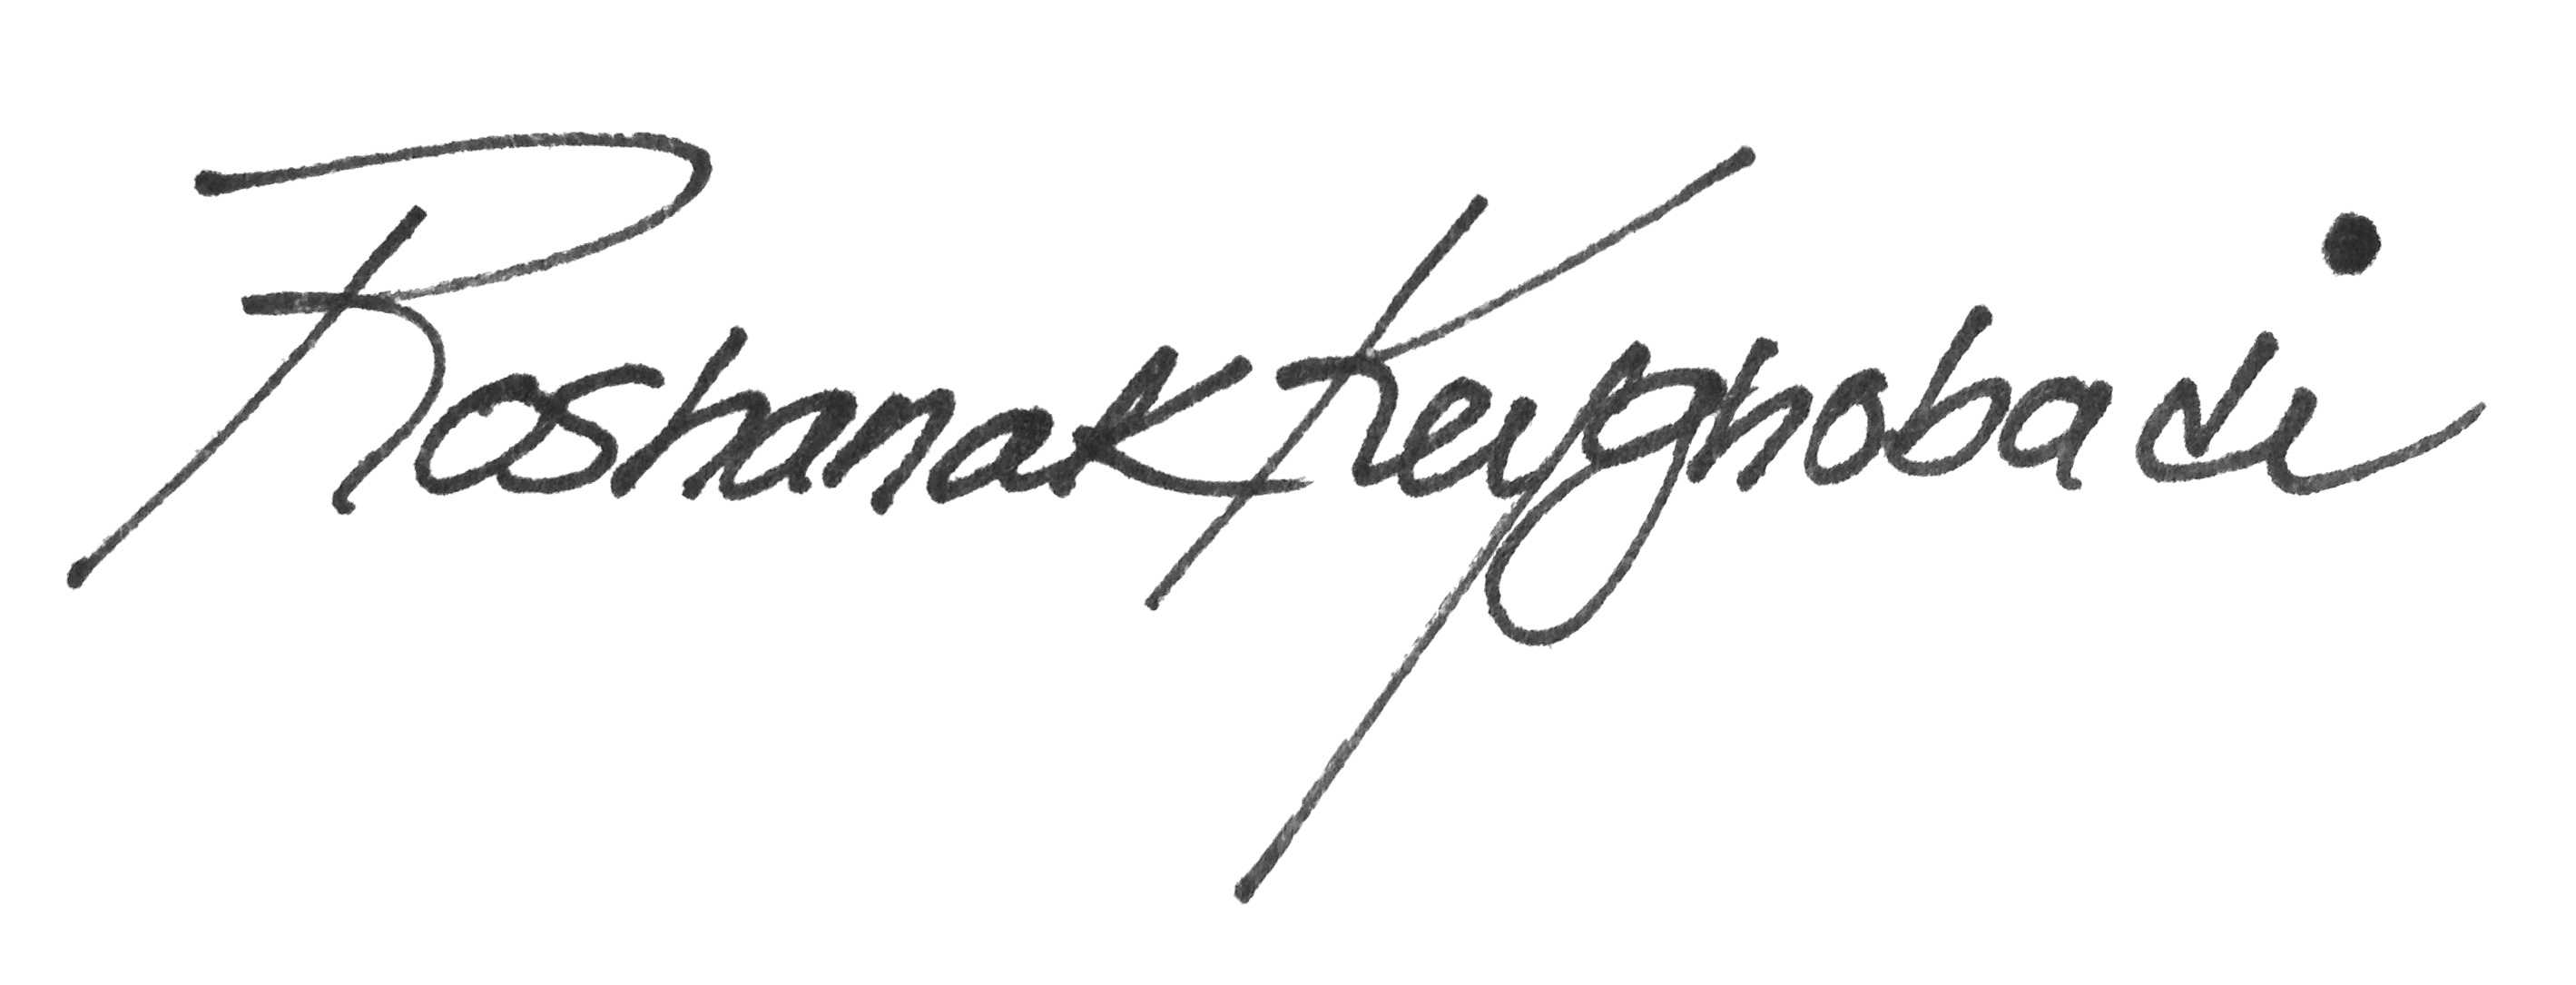 Roshanak Keyghobadi's Signature